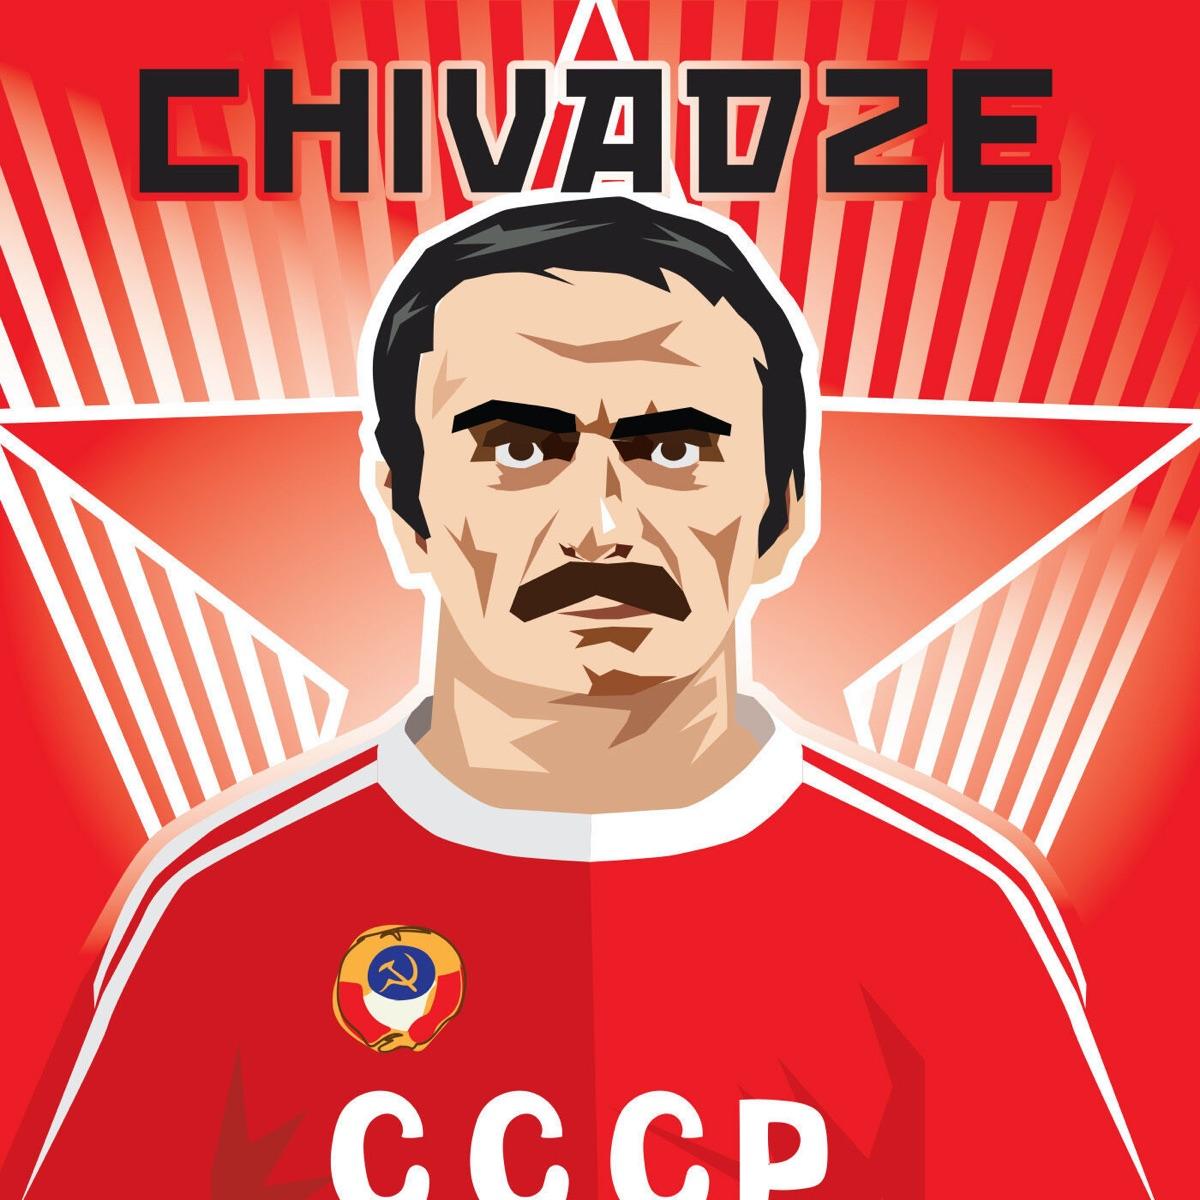 Chivadze